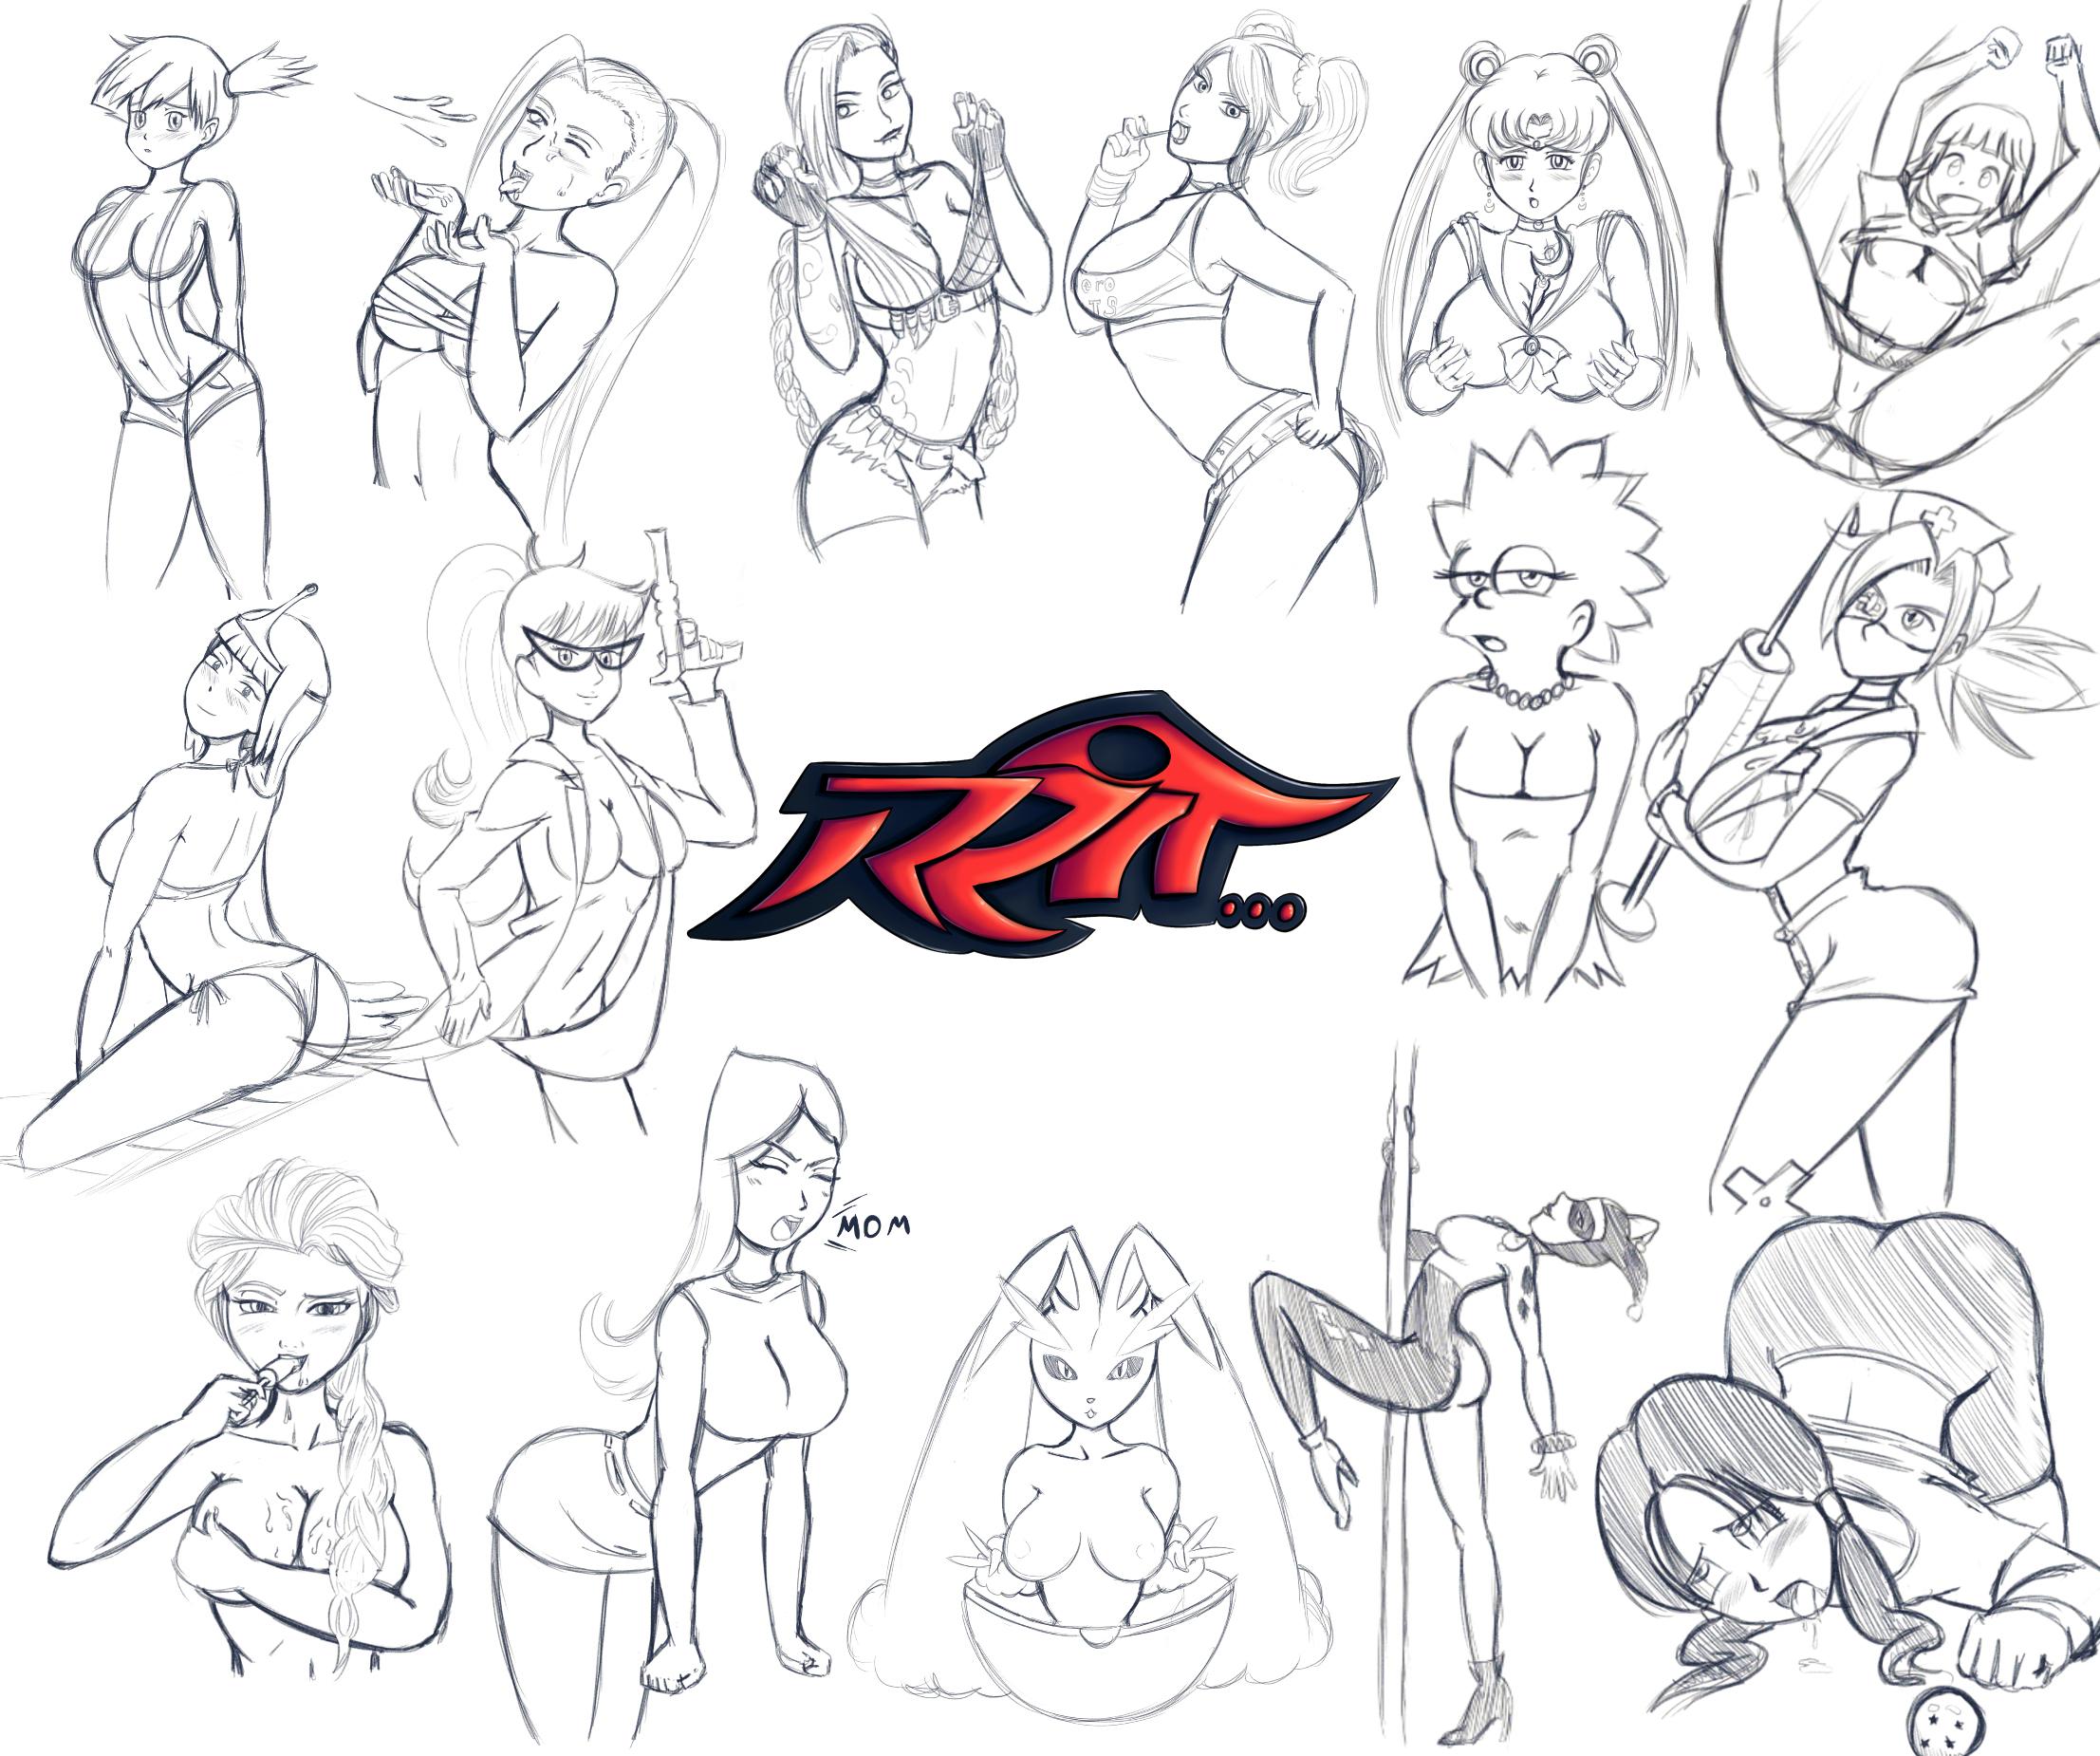 Sketching Sketches!